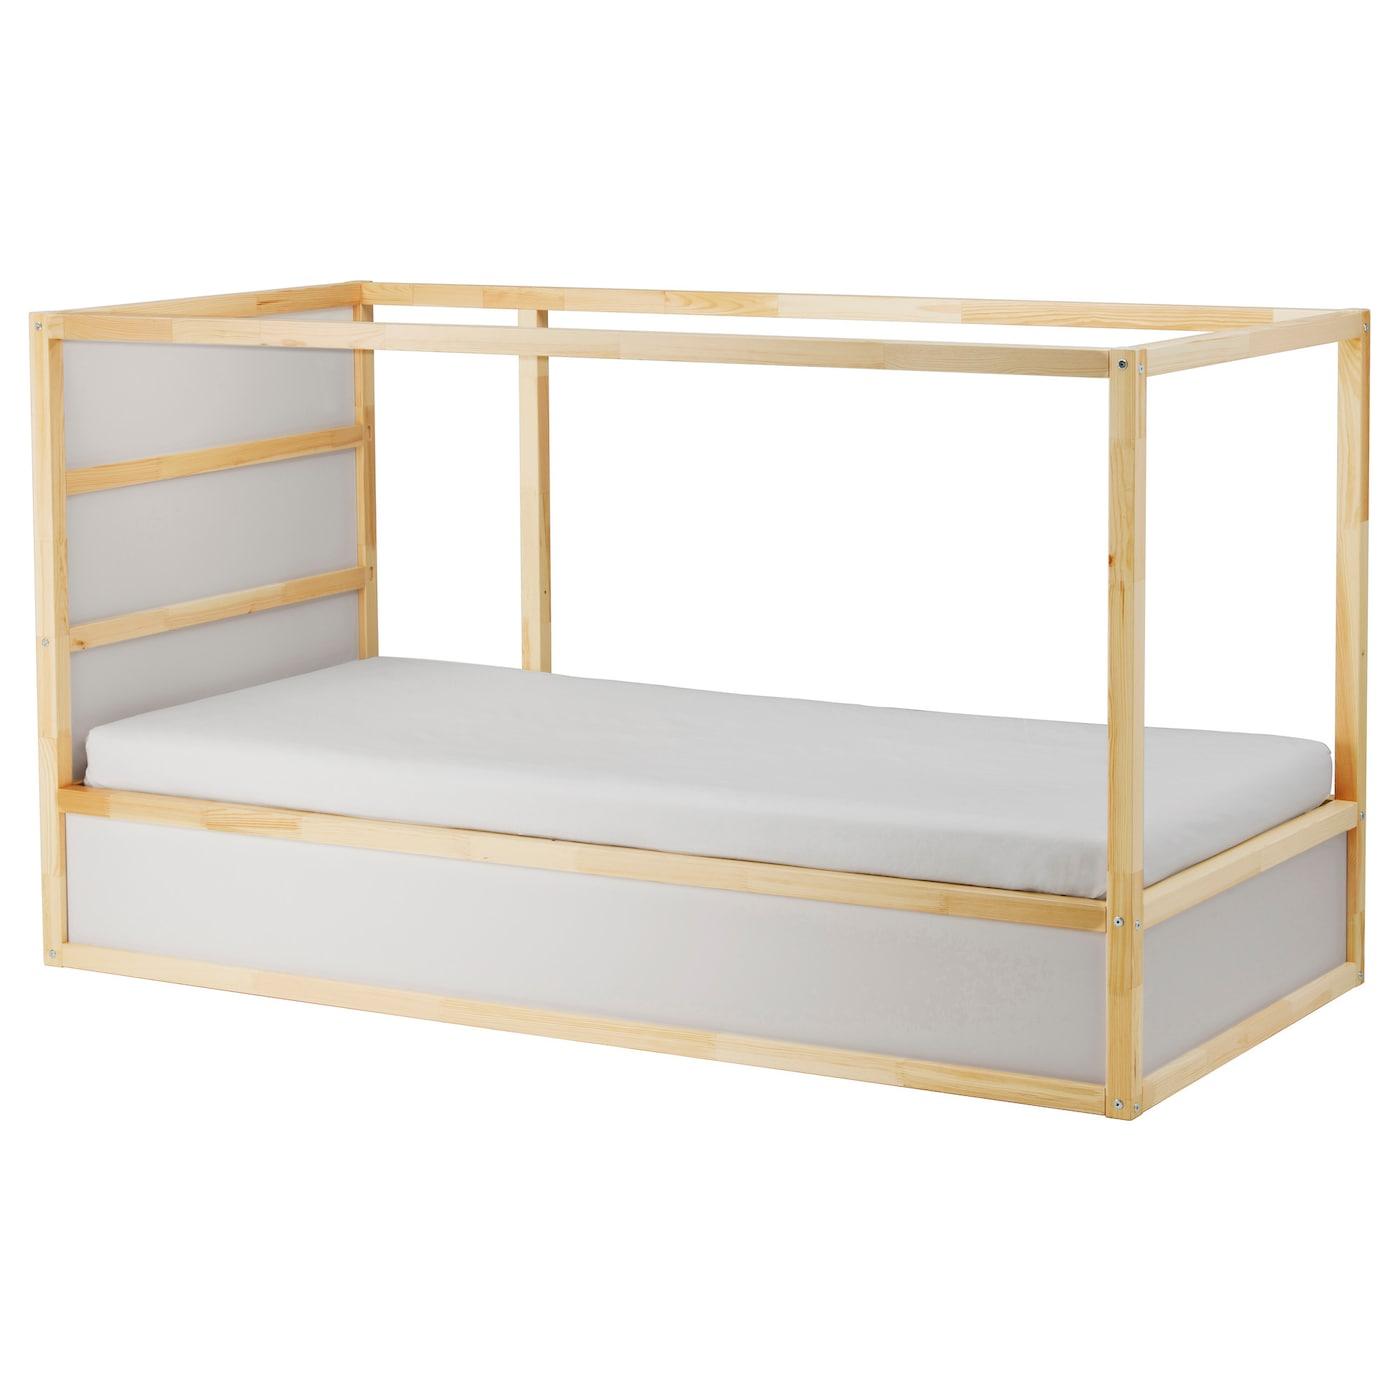 Cama reversible, blanco, pino, 90x200 cm